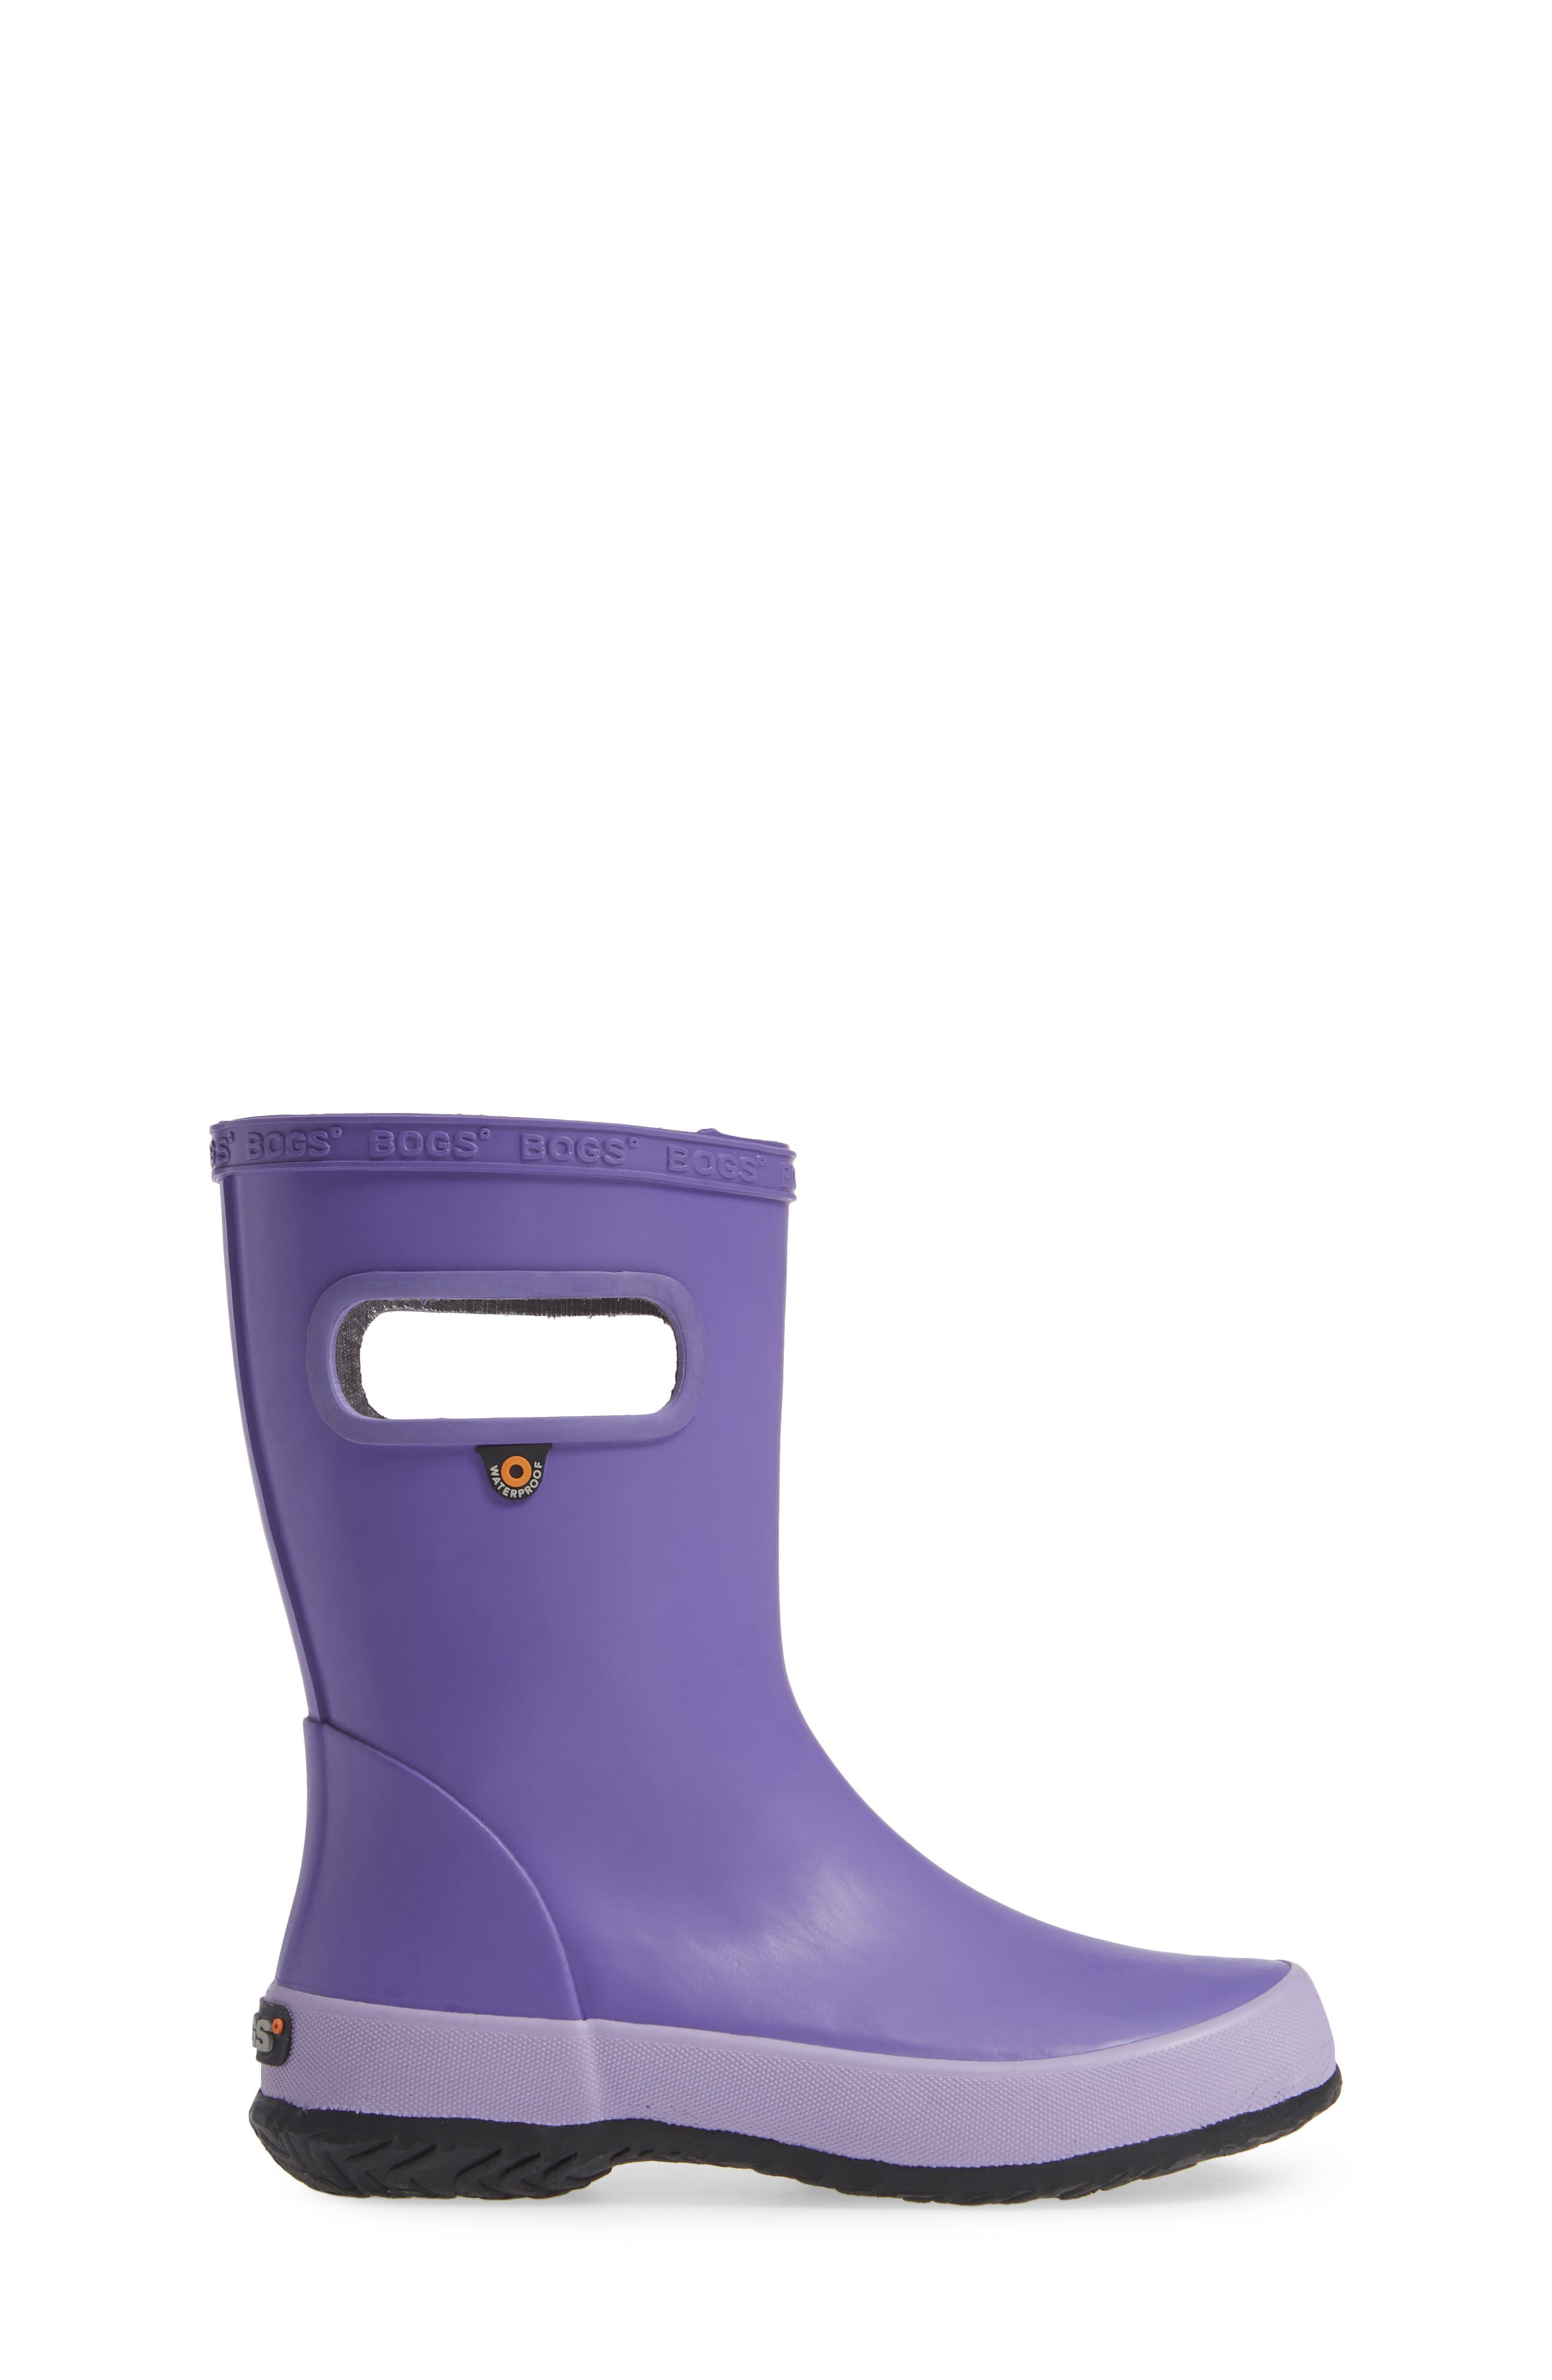 BOGS,                             Skipper Solid Rubber Waterproof Rain Boot,                             Alternate thumbnail 3, color,                             531